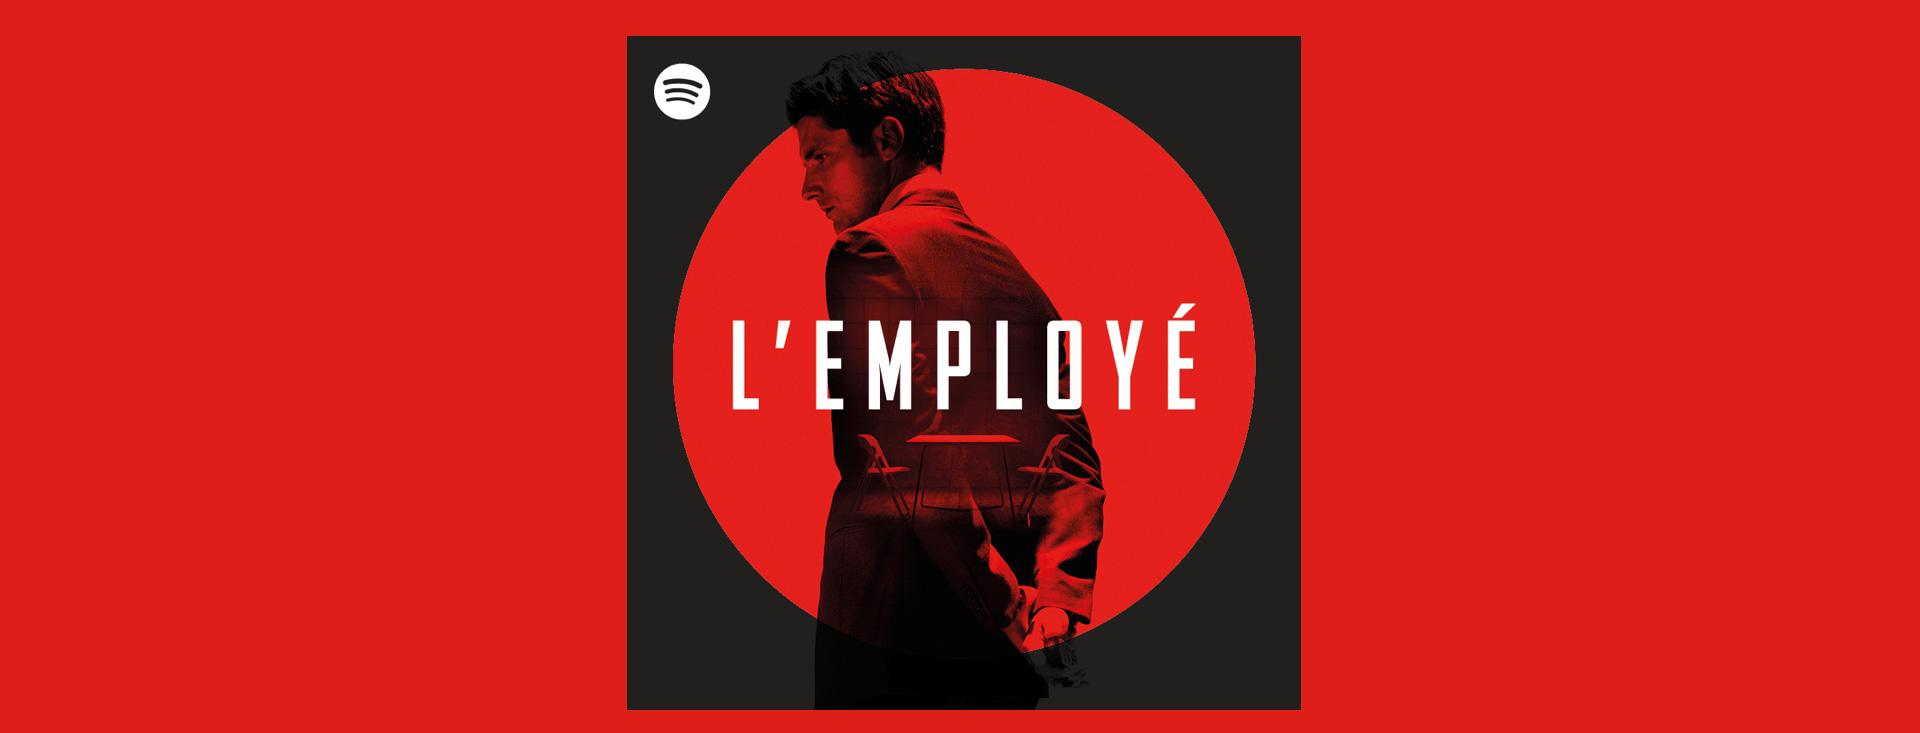 L'Employé - Série Audio Originale Spotify